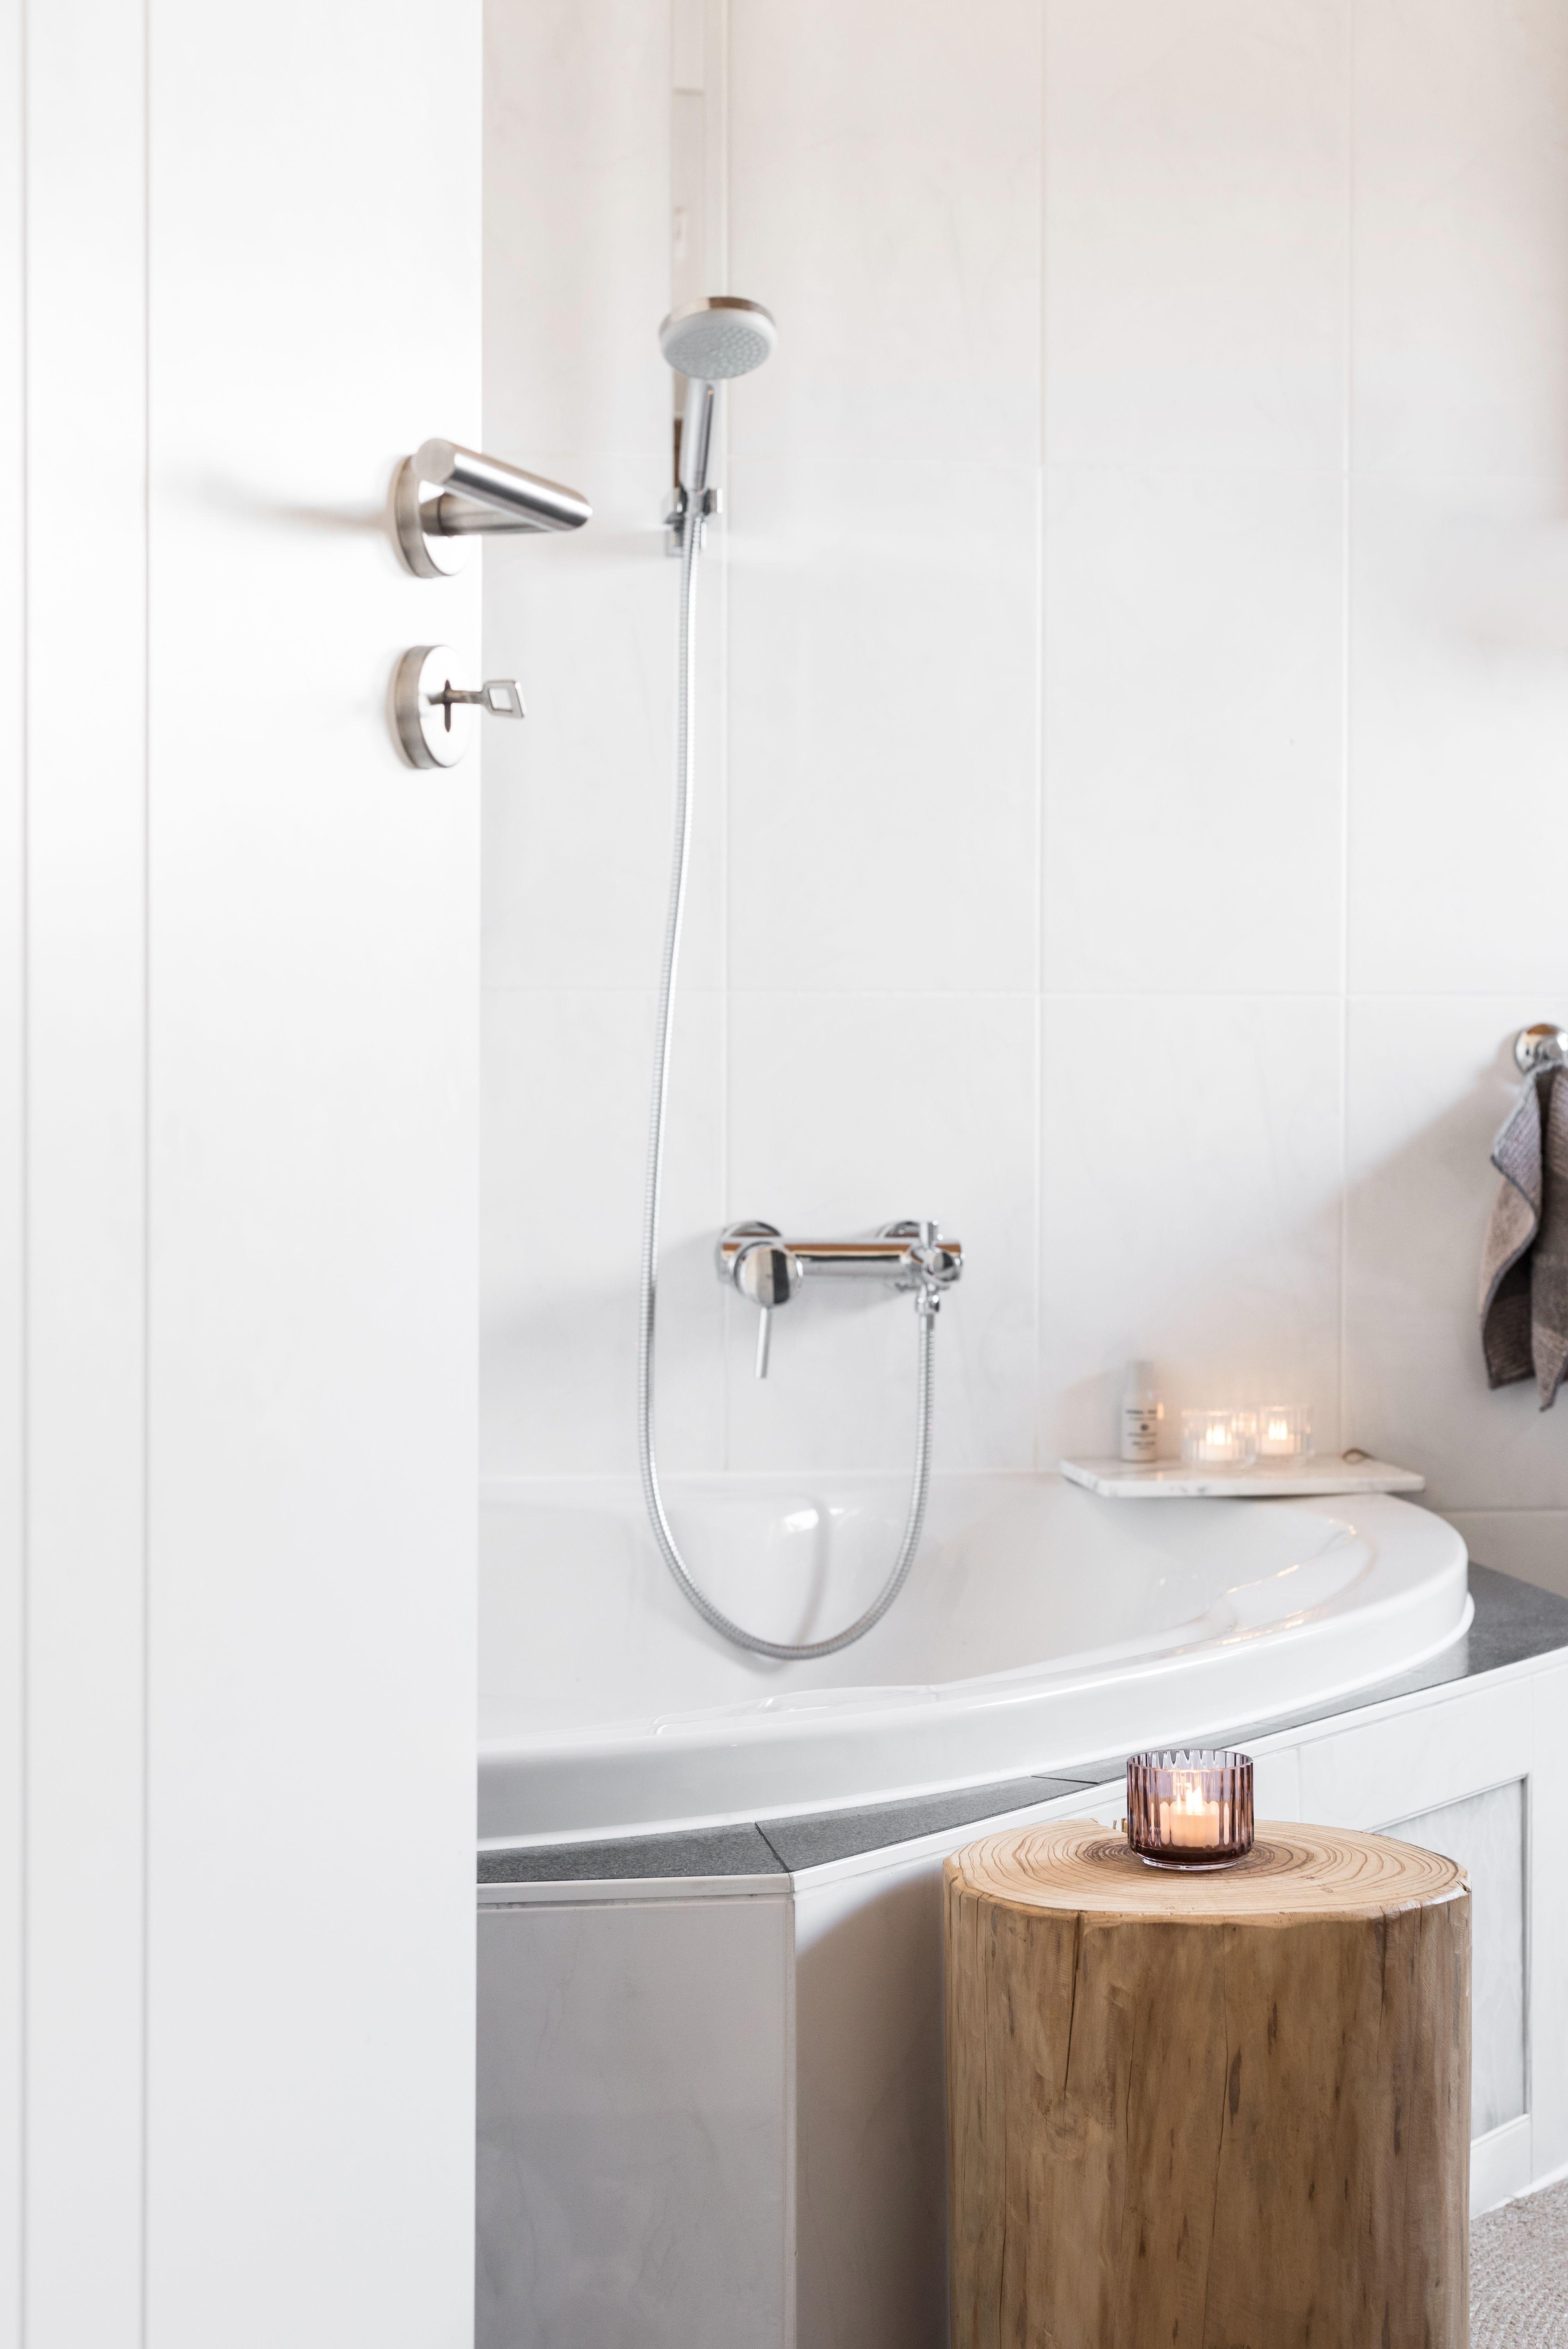 BADEZIMMER #bathroom #interior #whiteinterior #wood #lyngby #candlelight #interiordesign #bathroominspo #inspohome #homedecor #minimalsm #bath #nordicminimalsm #scandinavian #inspohome